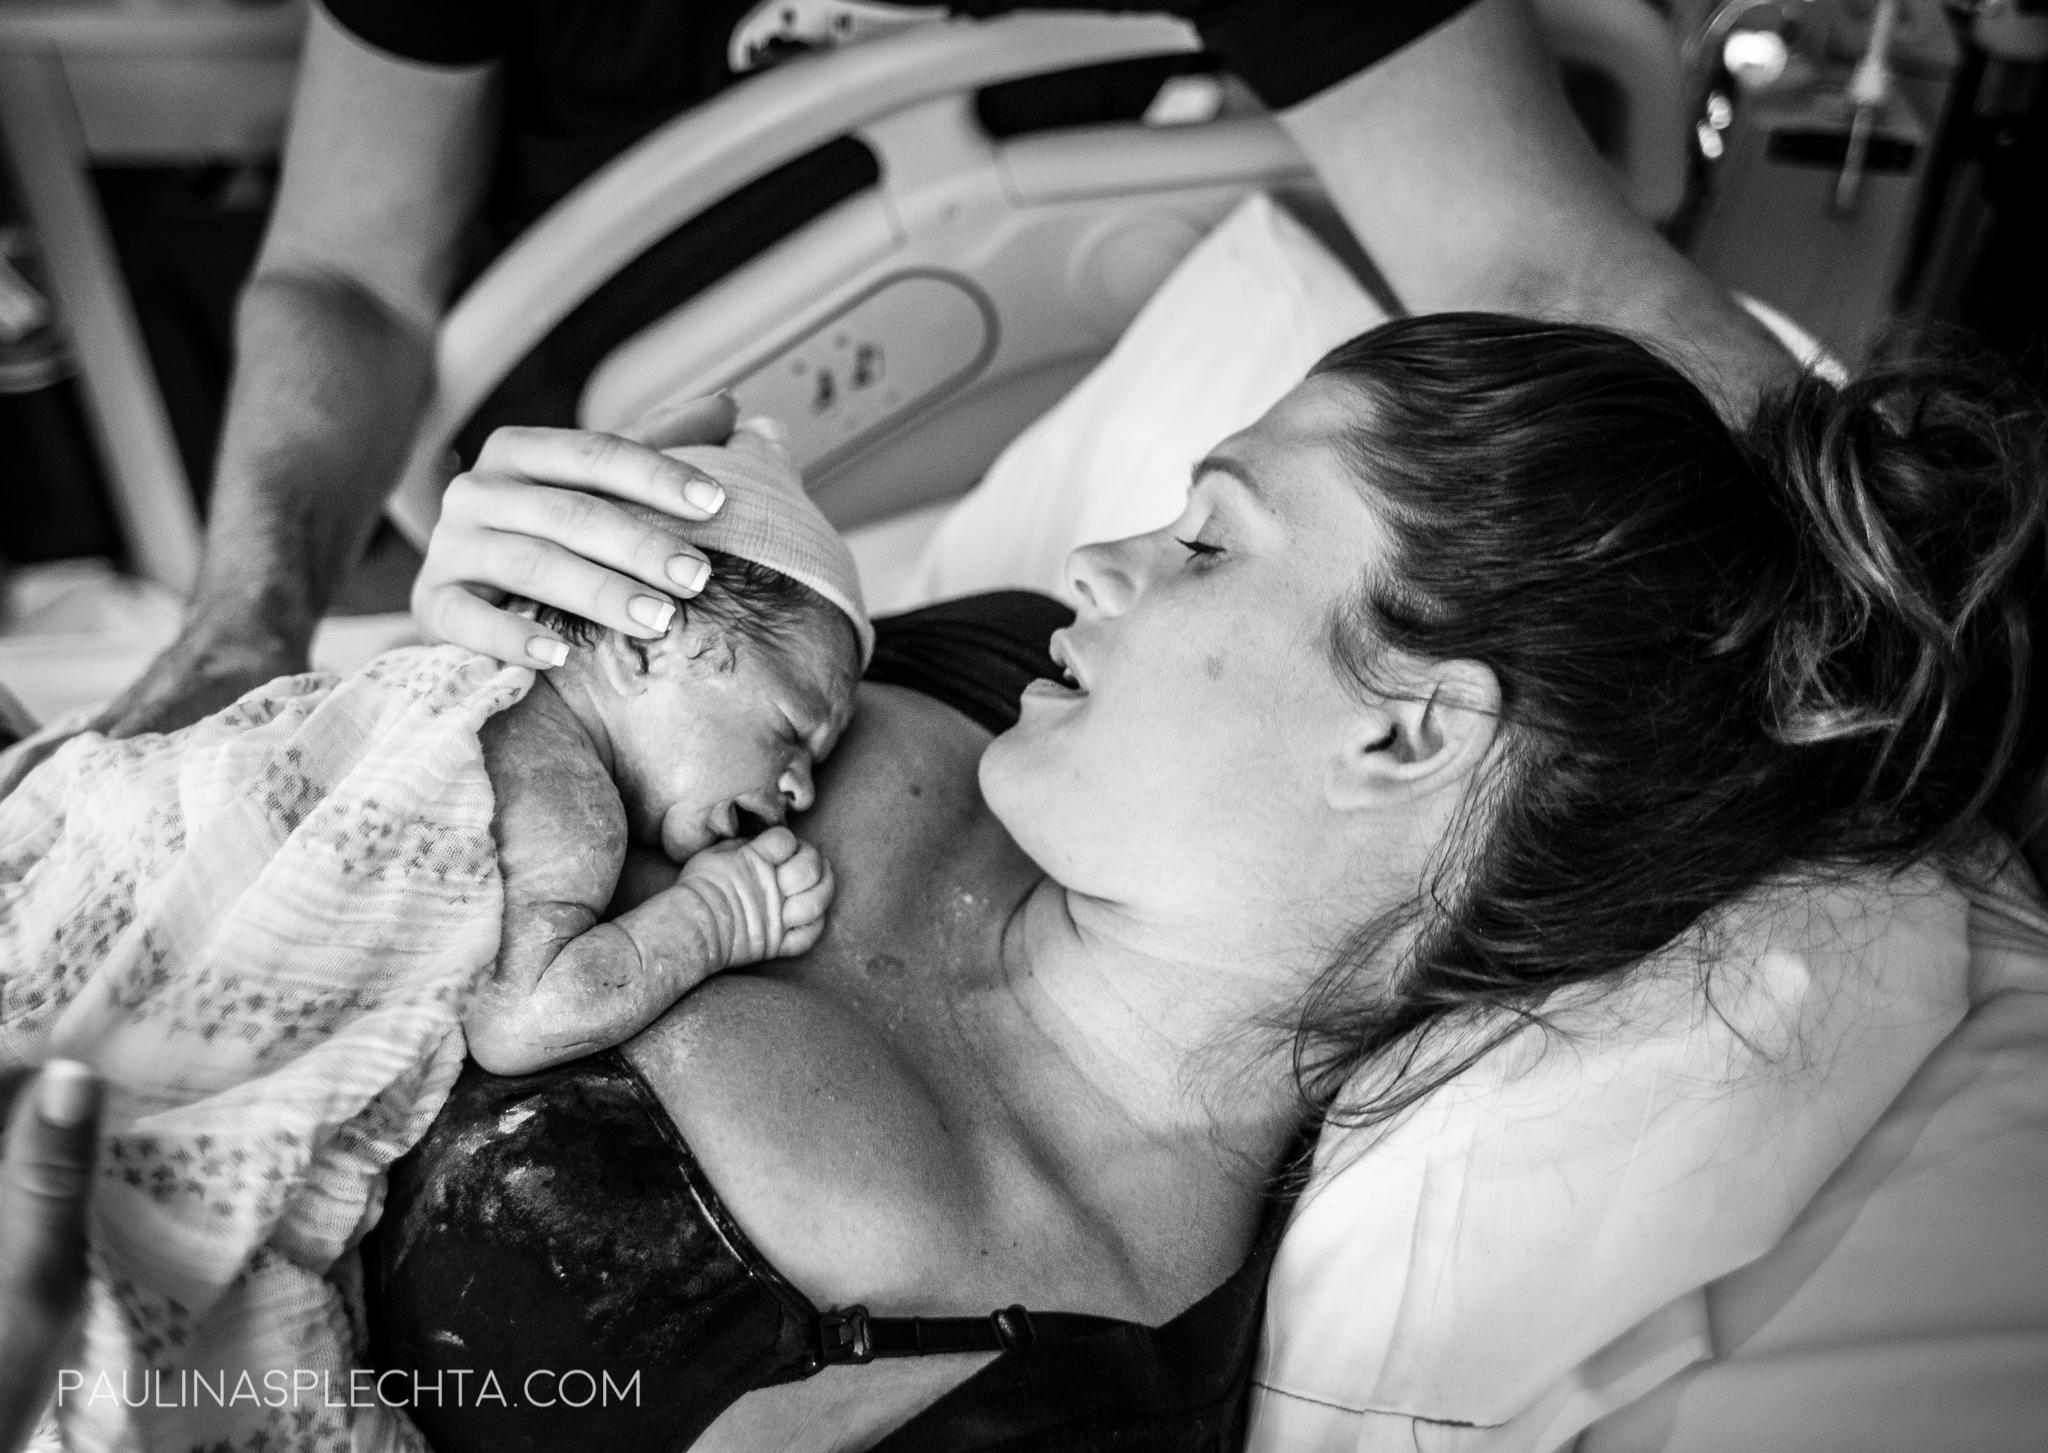 pregnant-duedate-breastfeeding-pregnancytest-pregnancysymptoms-morningsickness-delray-wellington-boynton-deerfieldbeach-northwest-westboca-coralspringsmedicalcenter-vbacmidwife-gestationaldiabetes-induced-lactationconsultant-preggo-edd-34.jpg